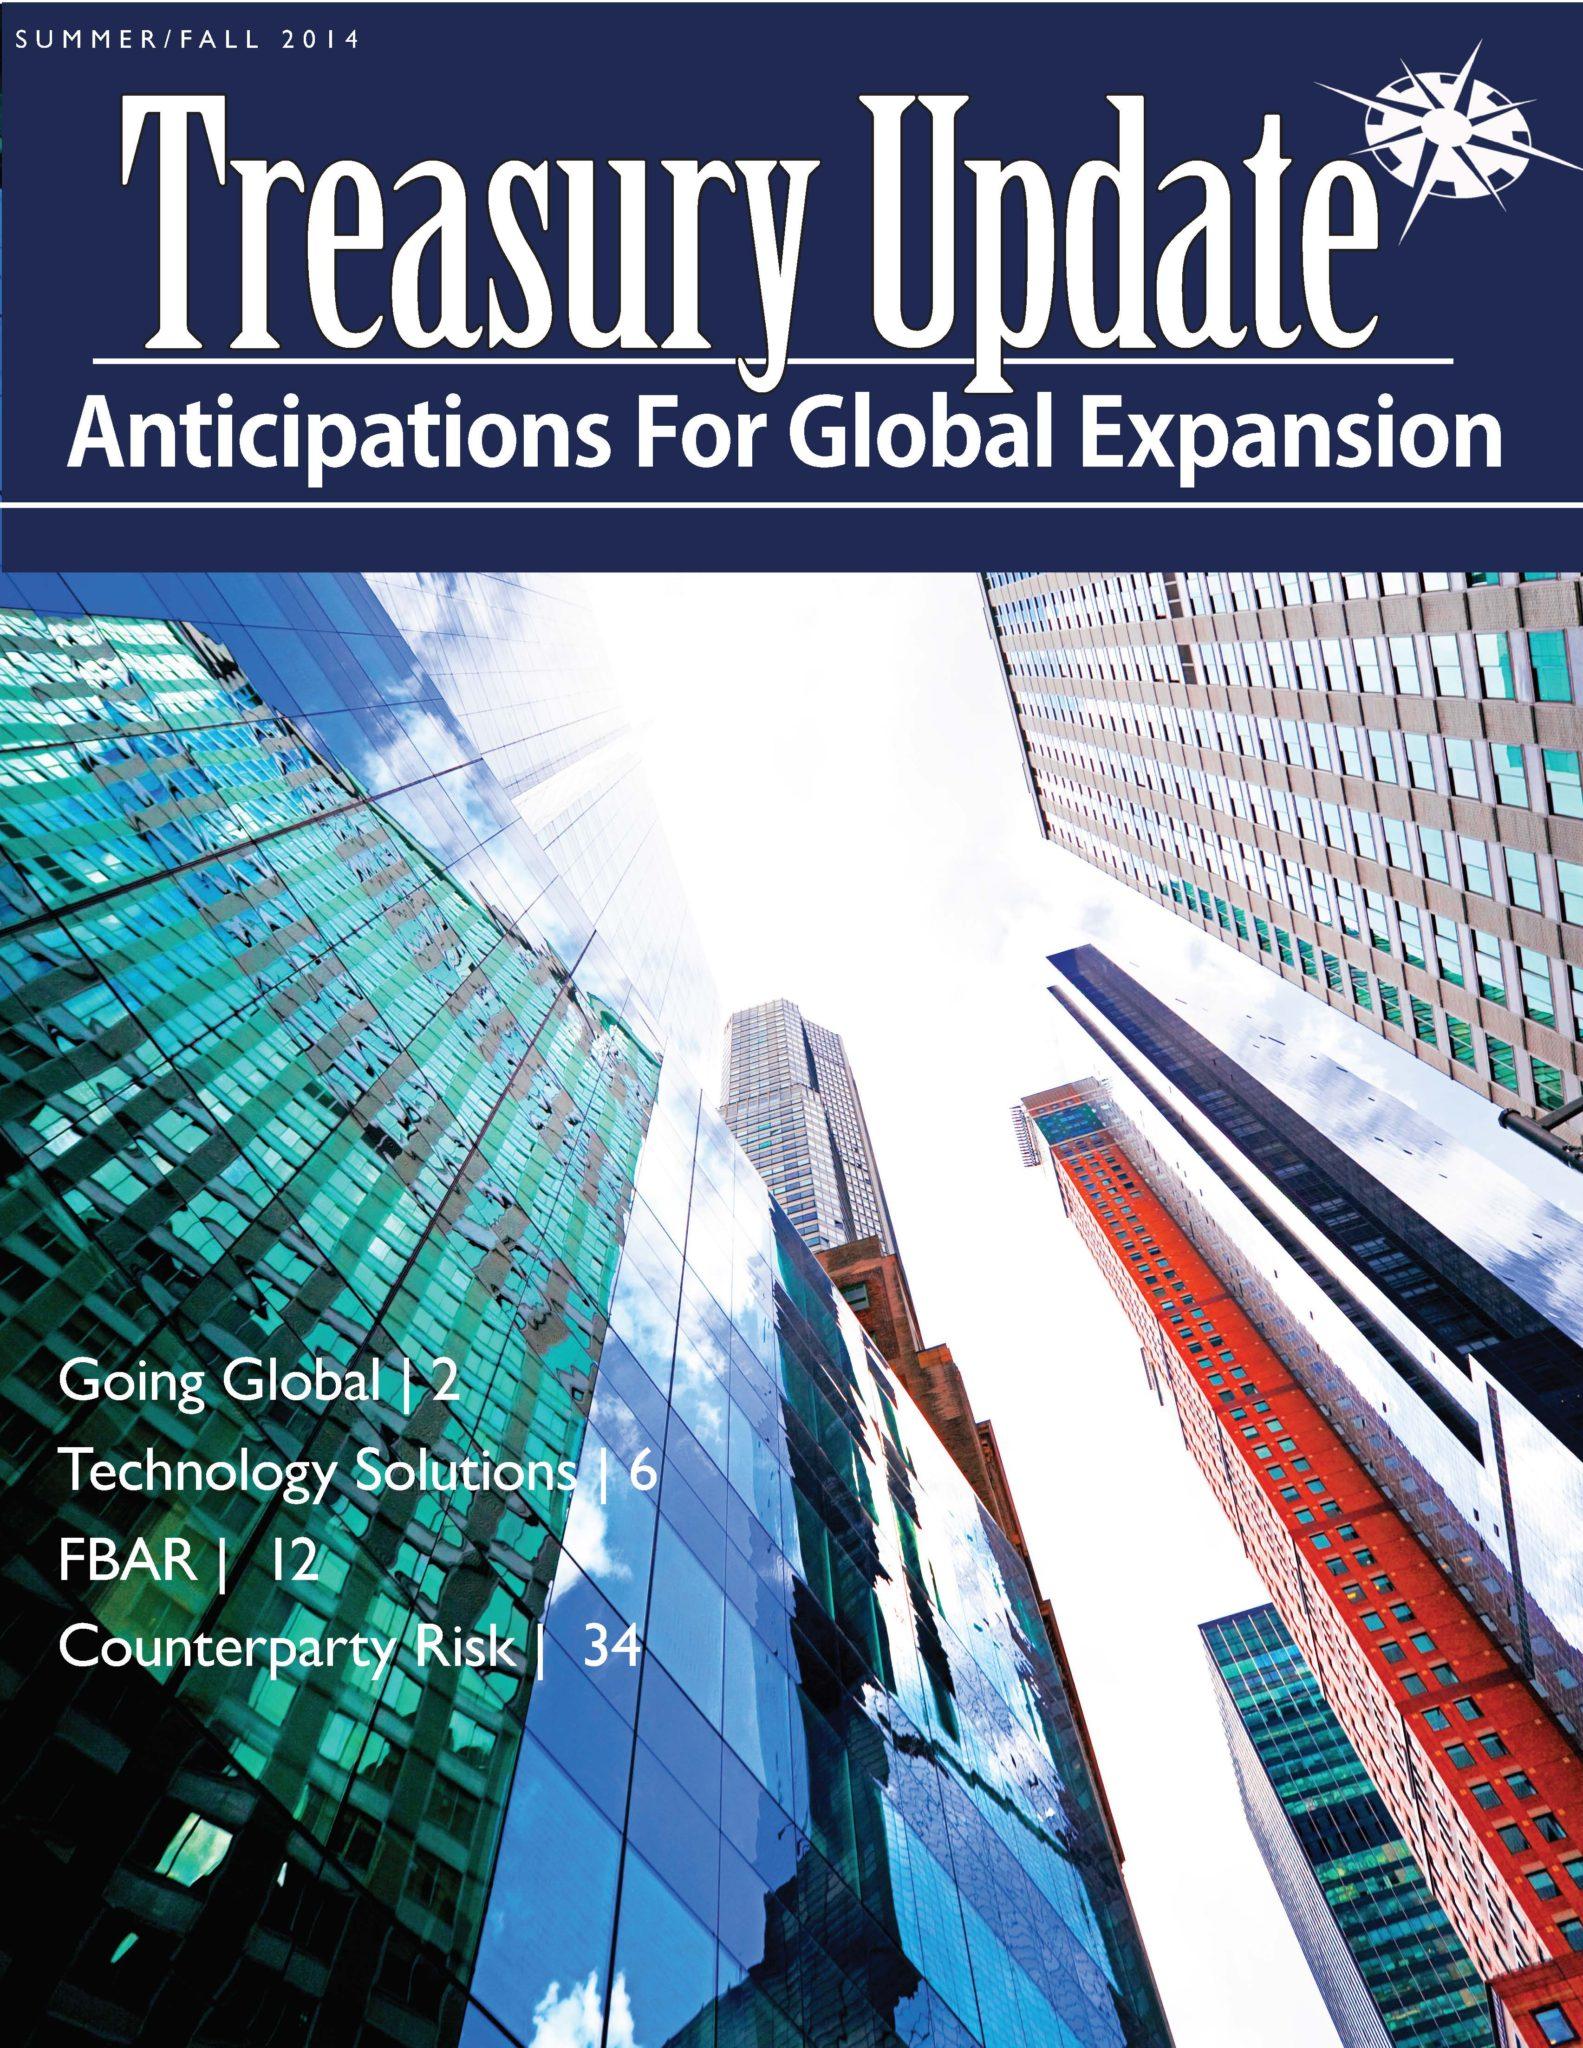 Summer/Fall 2014 Treasury Update Newsletter